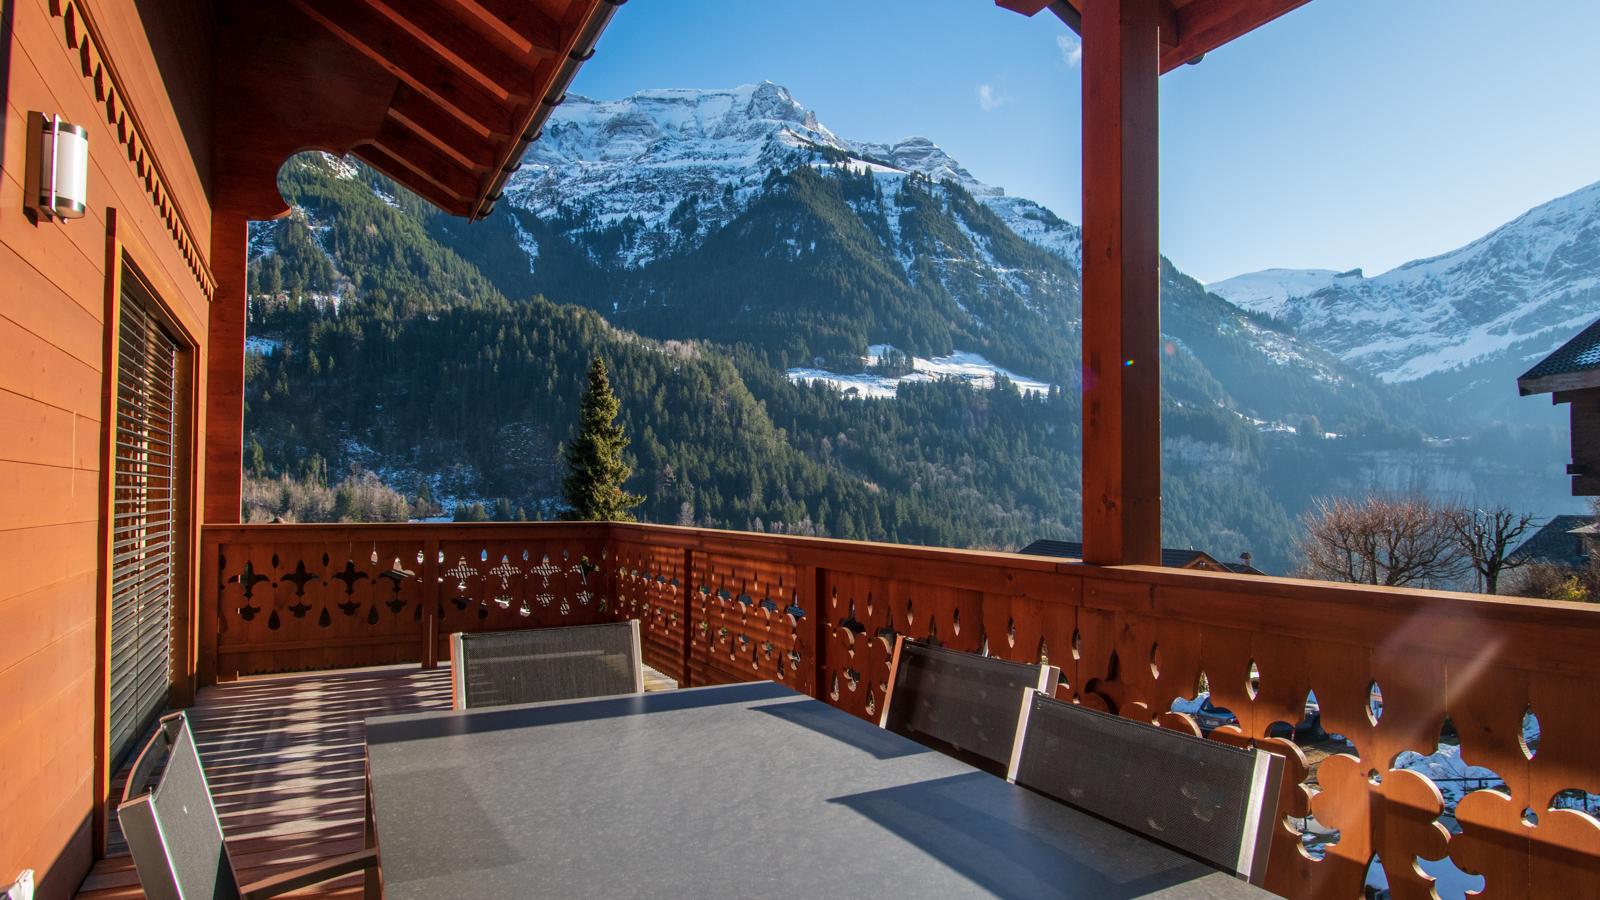 Chalet Dents-du-Midi Chalet, Switzerland